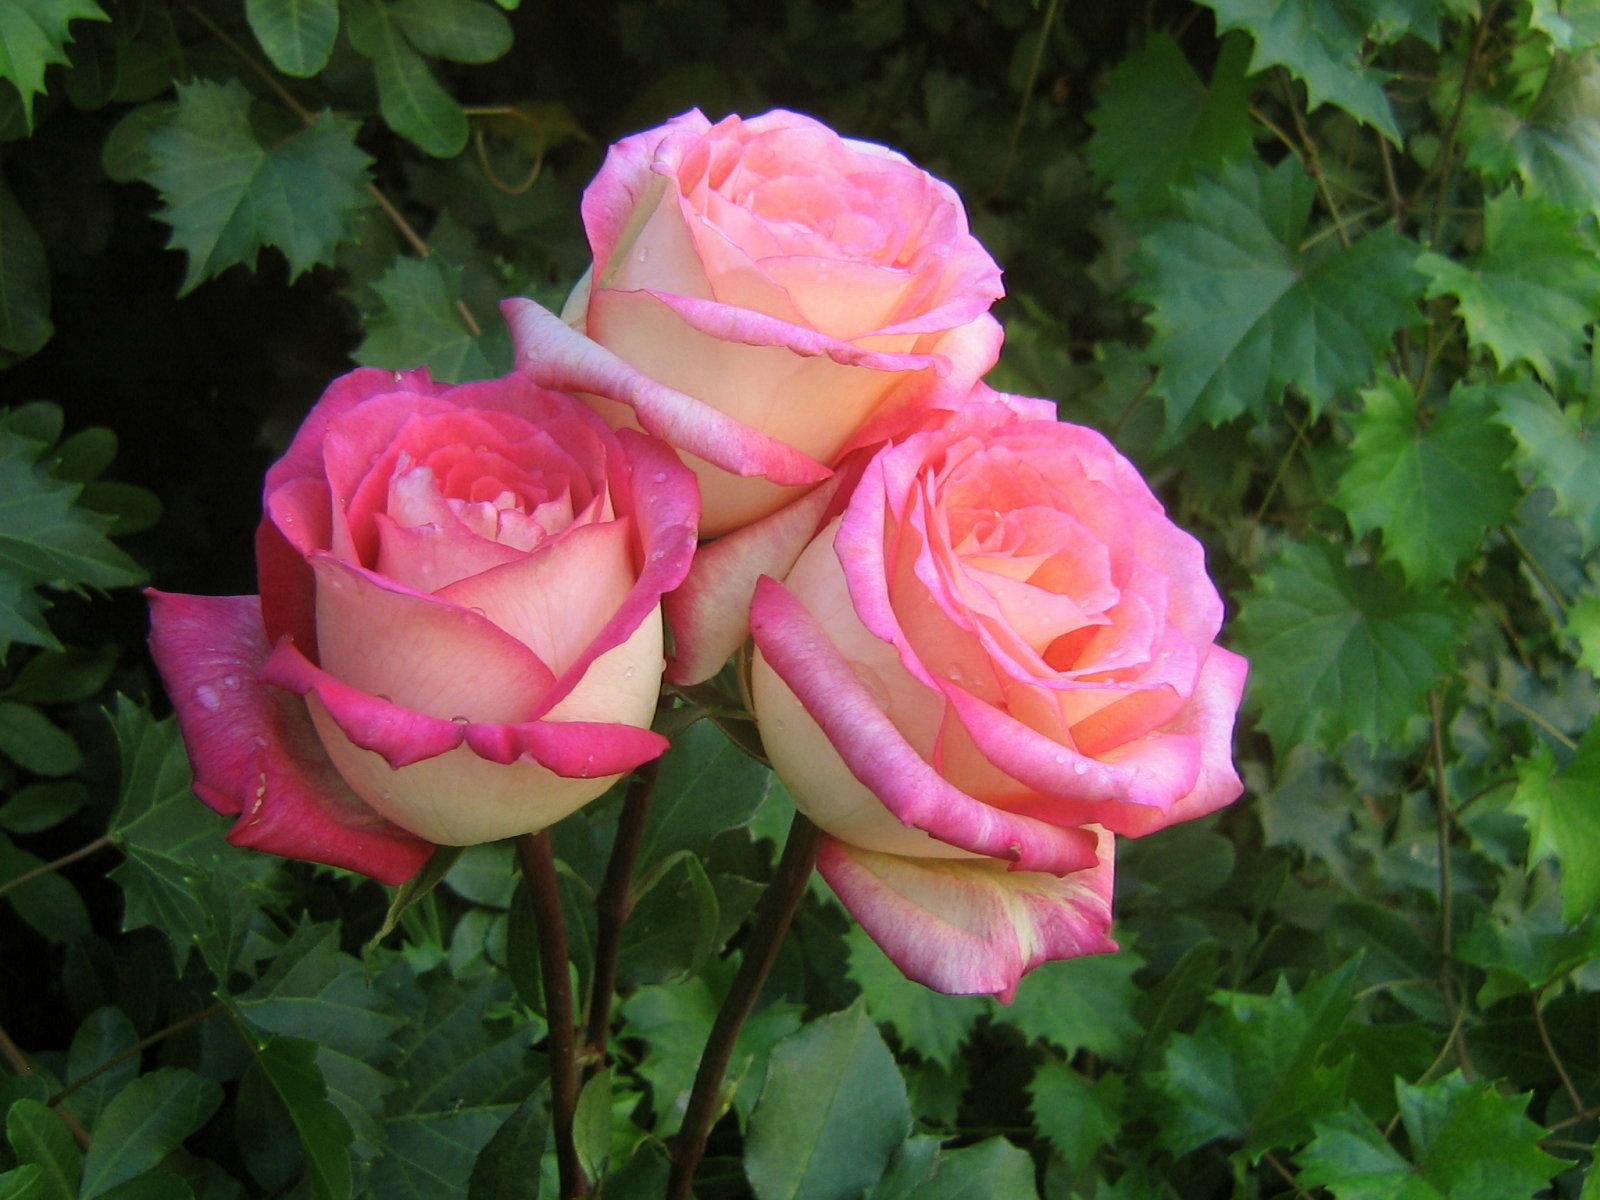 roses - photo #13